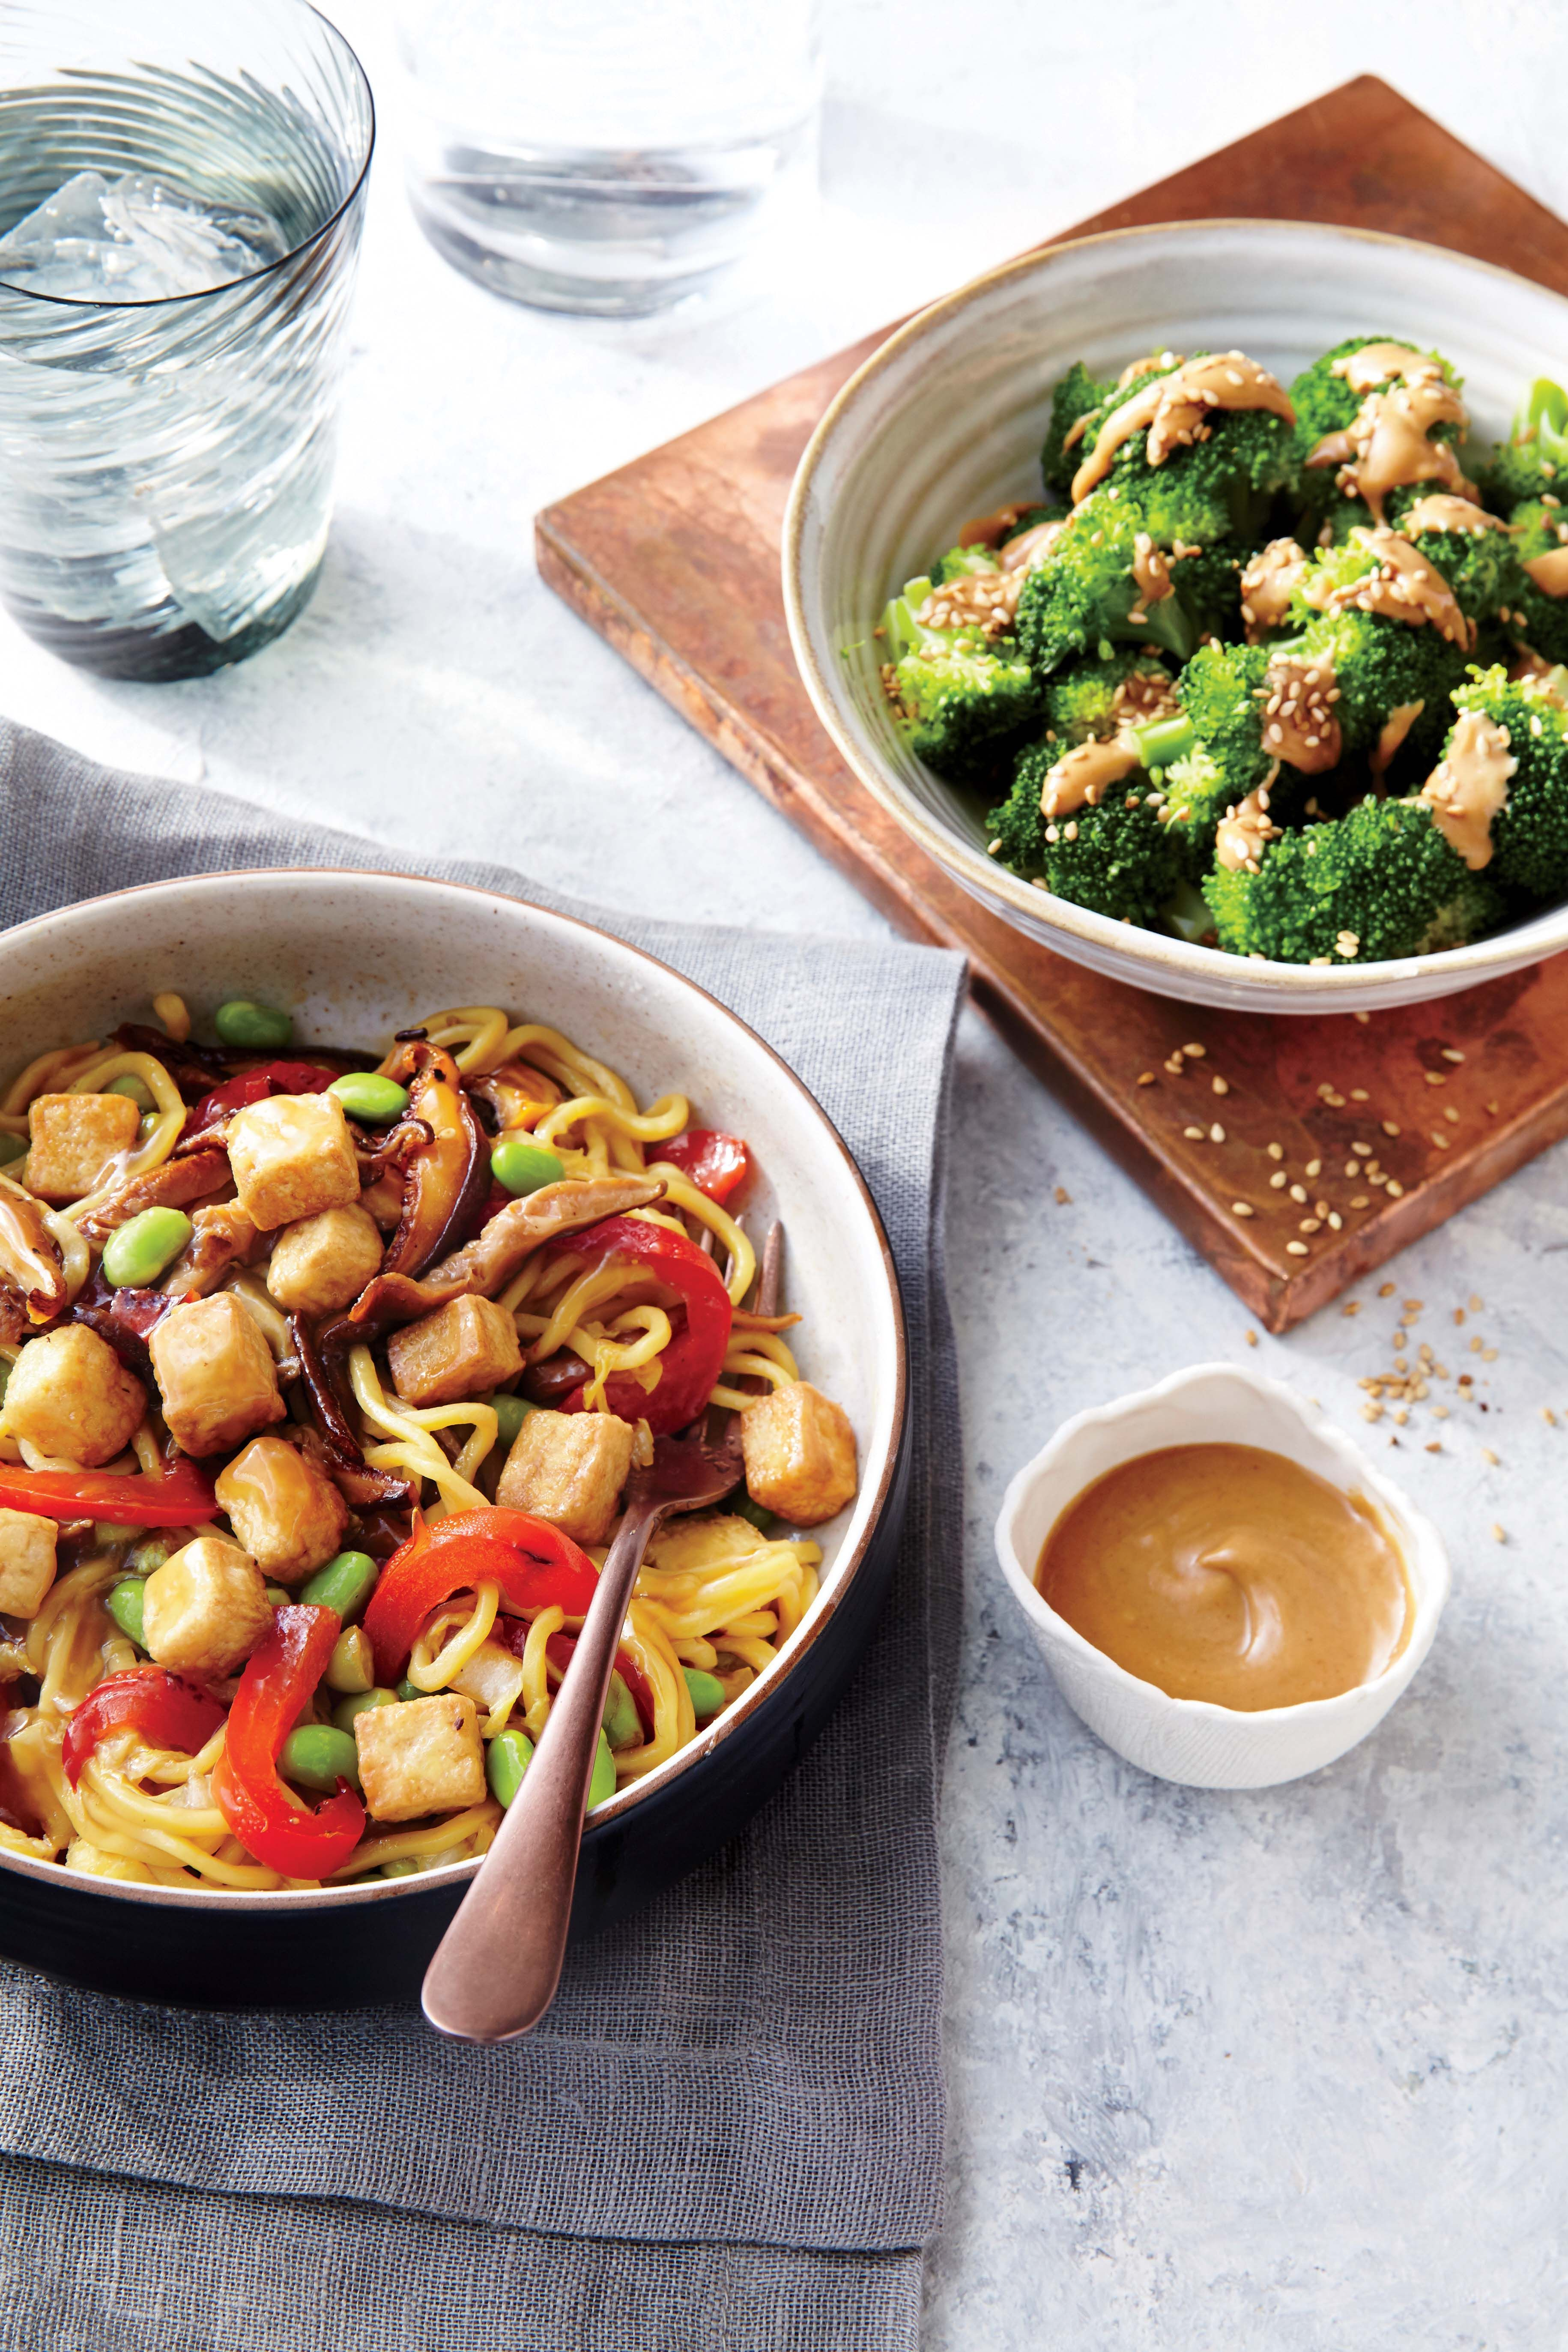 Dinner tonight vegetarian comidas saludables saludable y comida tofu and vegetable lo mein quick and easy vegetarian recipes for dinner tonight cooking forumfinder Gallery